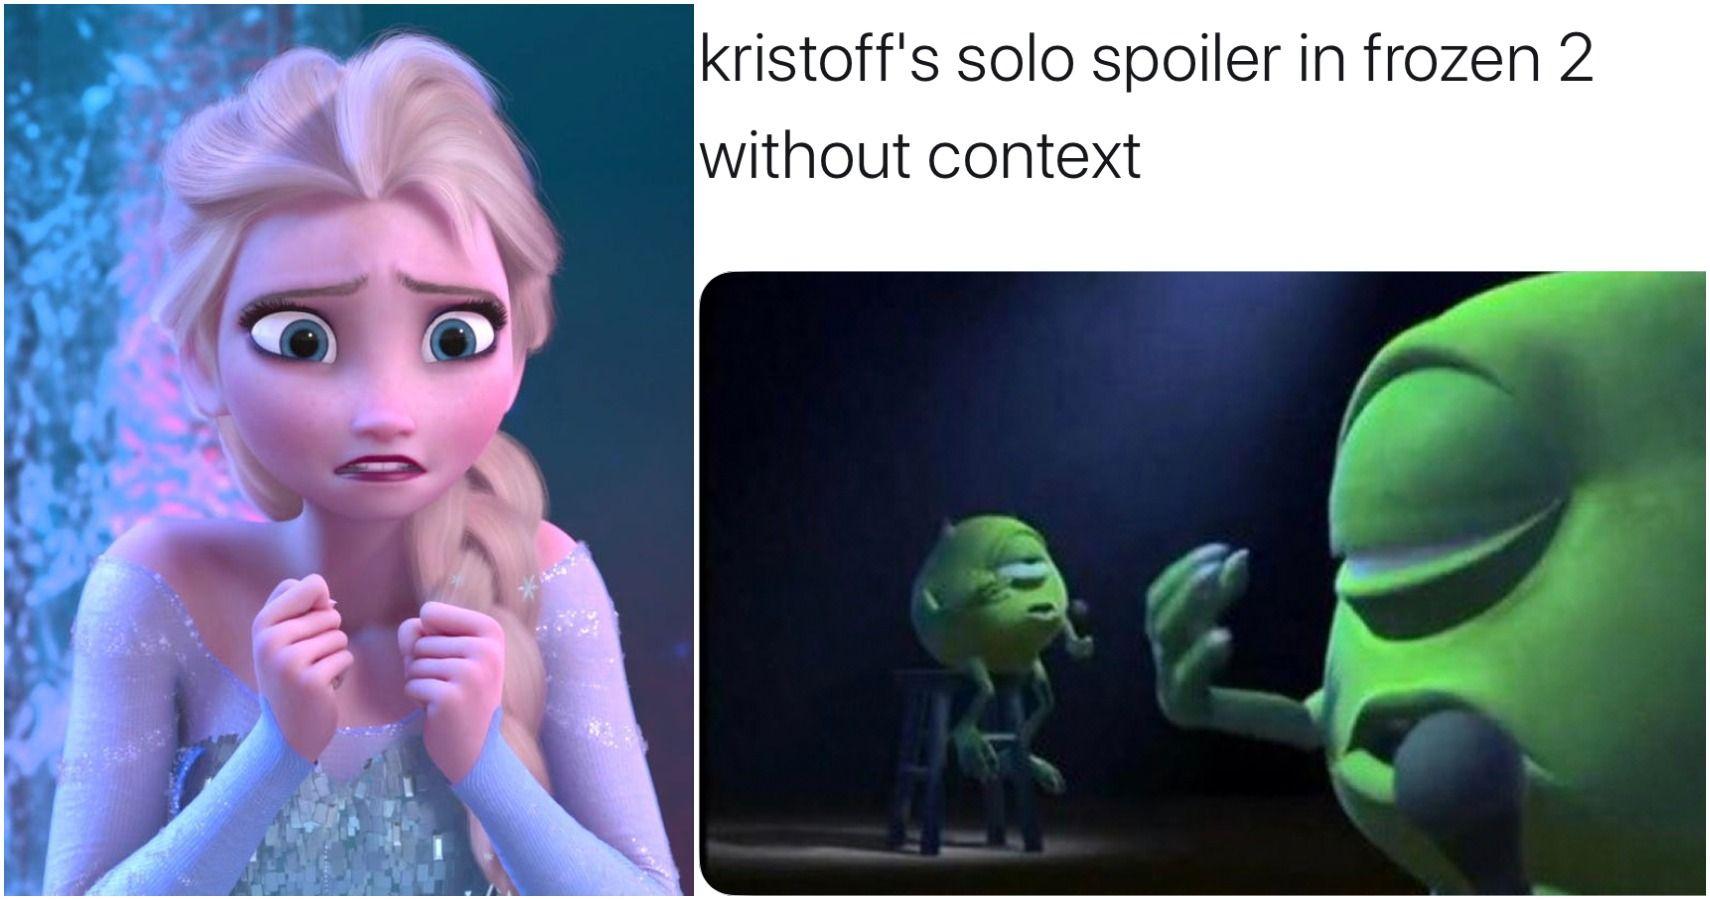 13 Hilarious Frozen 2 Memes Only Disney Fans Will Understand